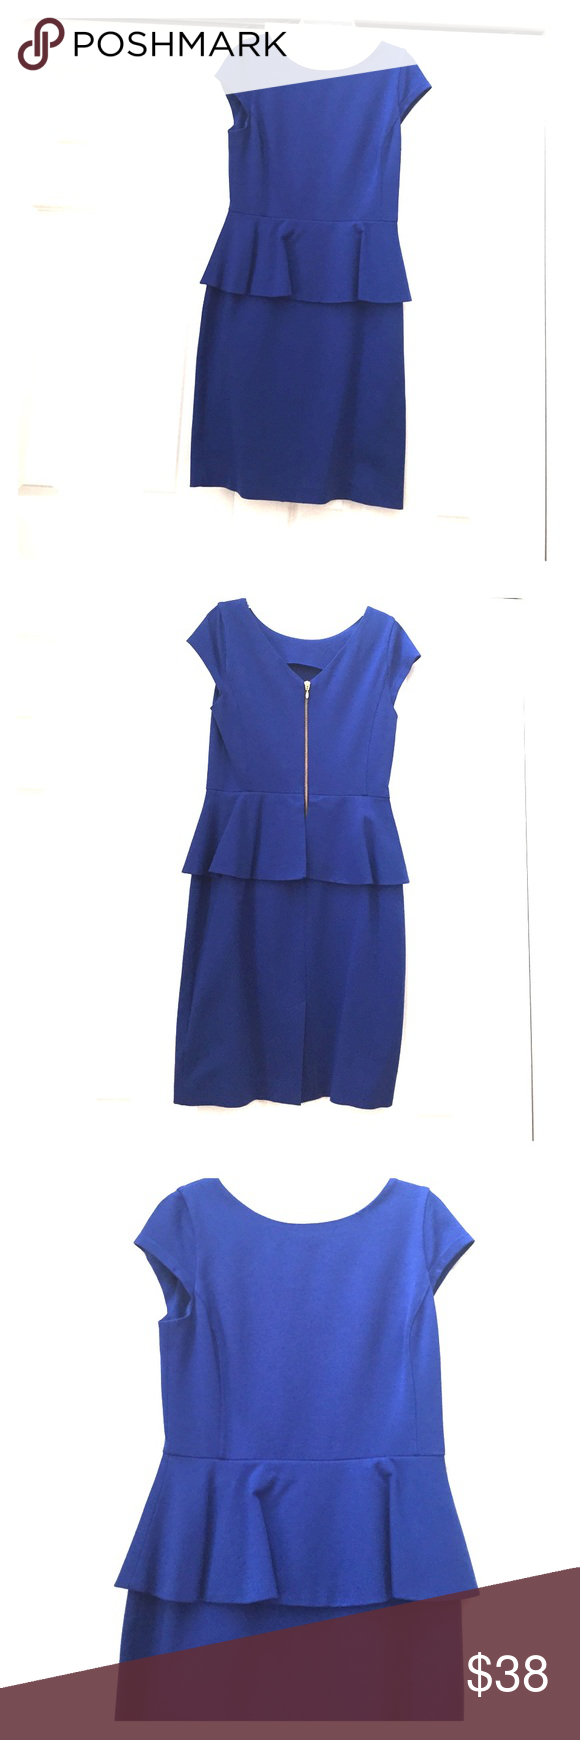 Banana Republic Peplum Dress Royal Blue - Size 4 Banana Republic Dresses Midi